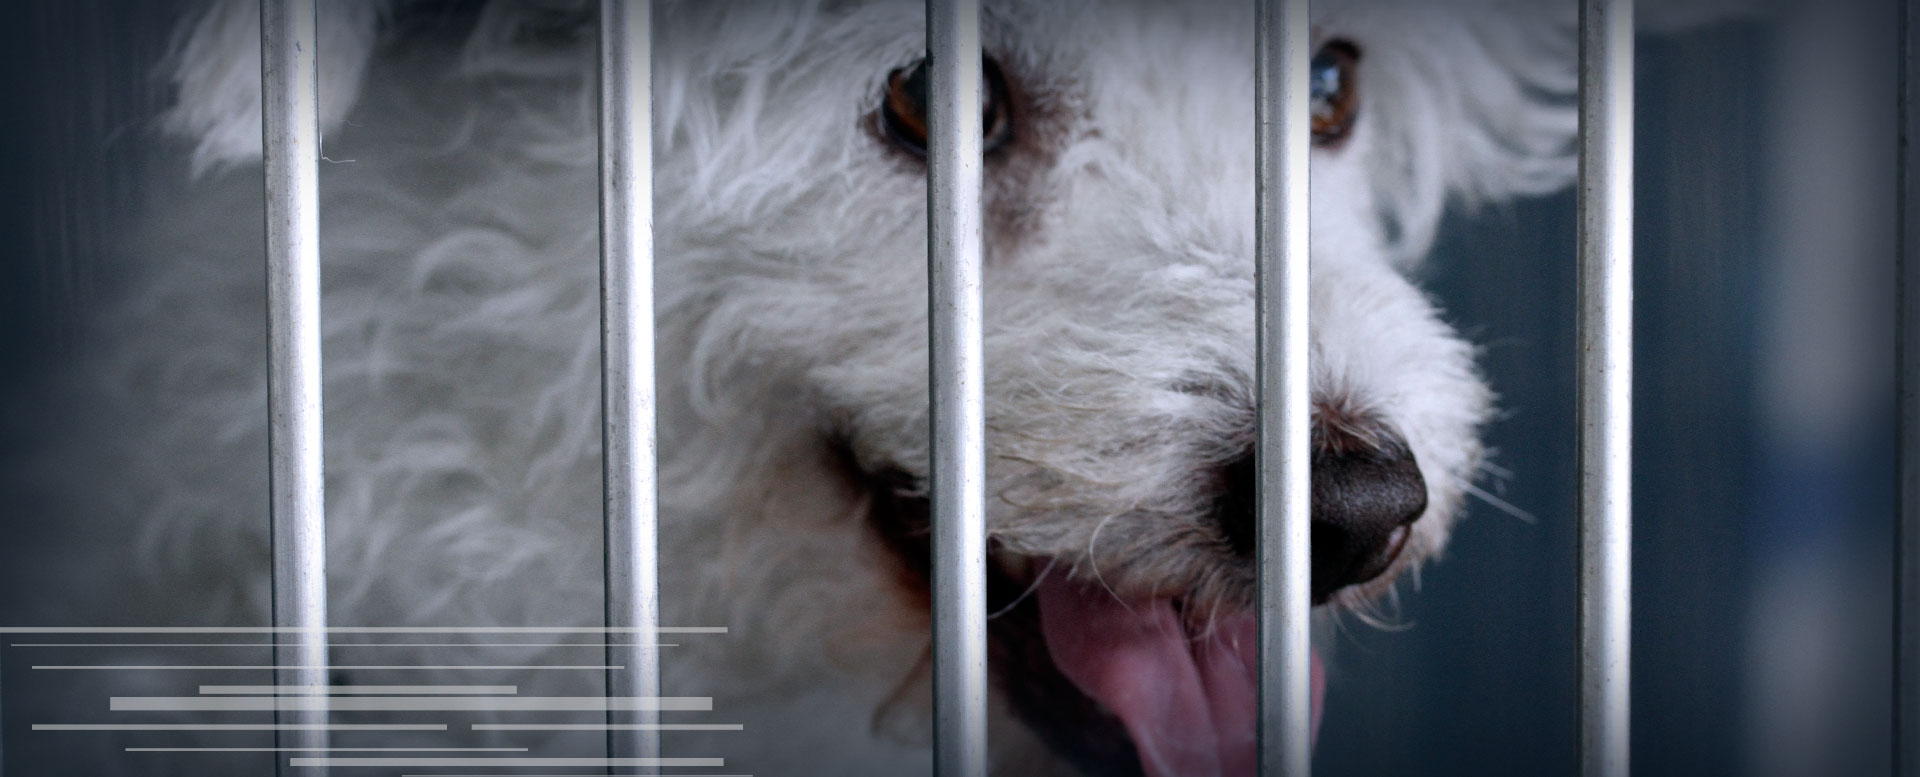 Medicina preventiva veterinaria | Centro Médico Veterinario Alivet 24 horas